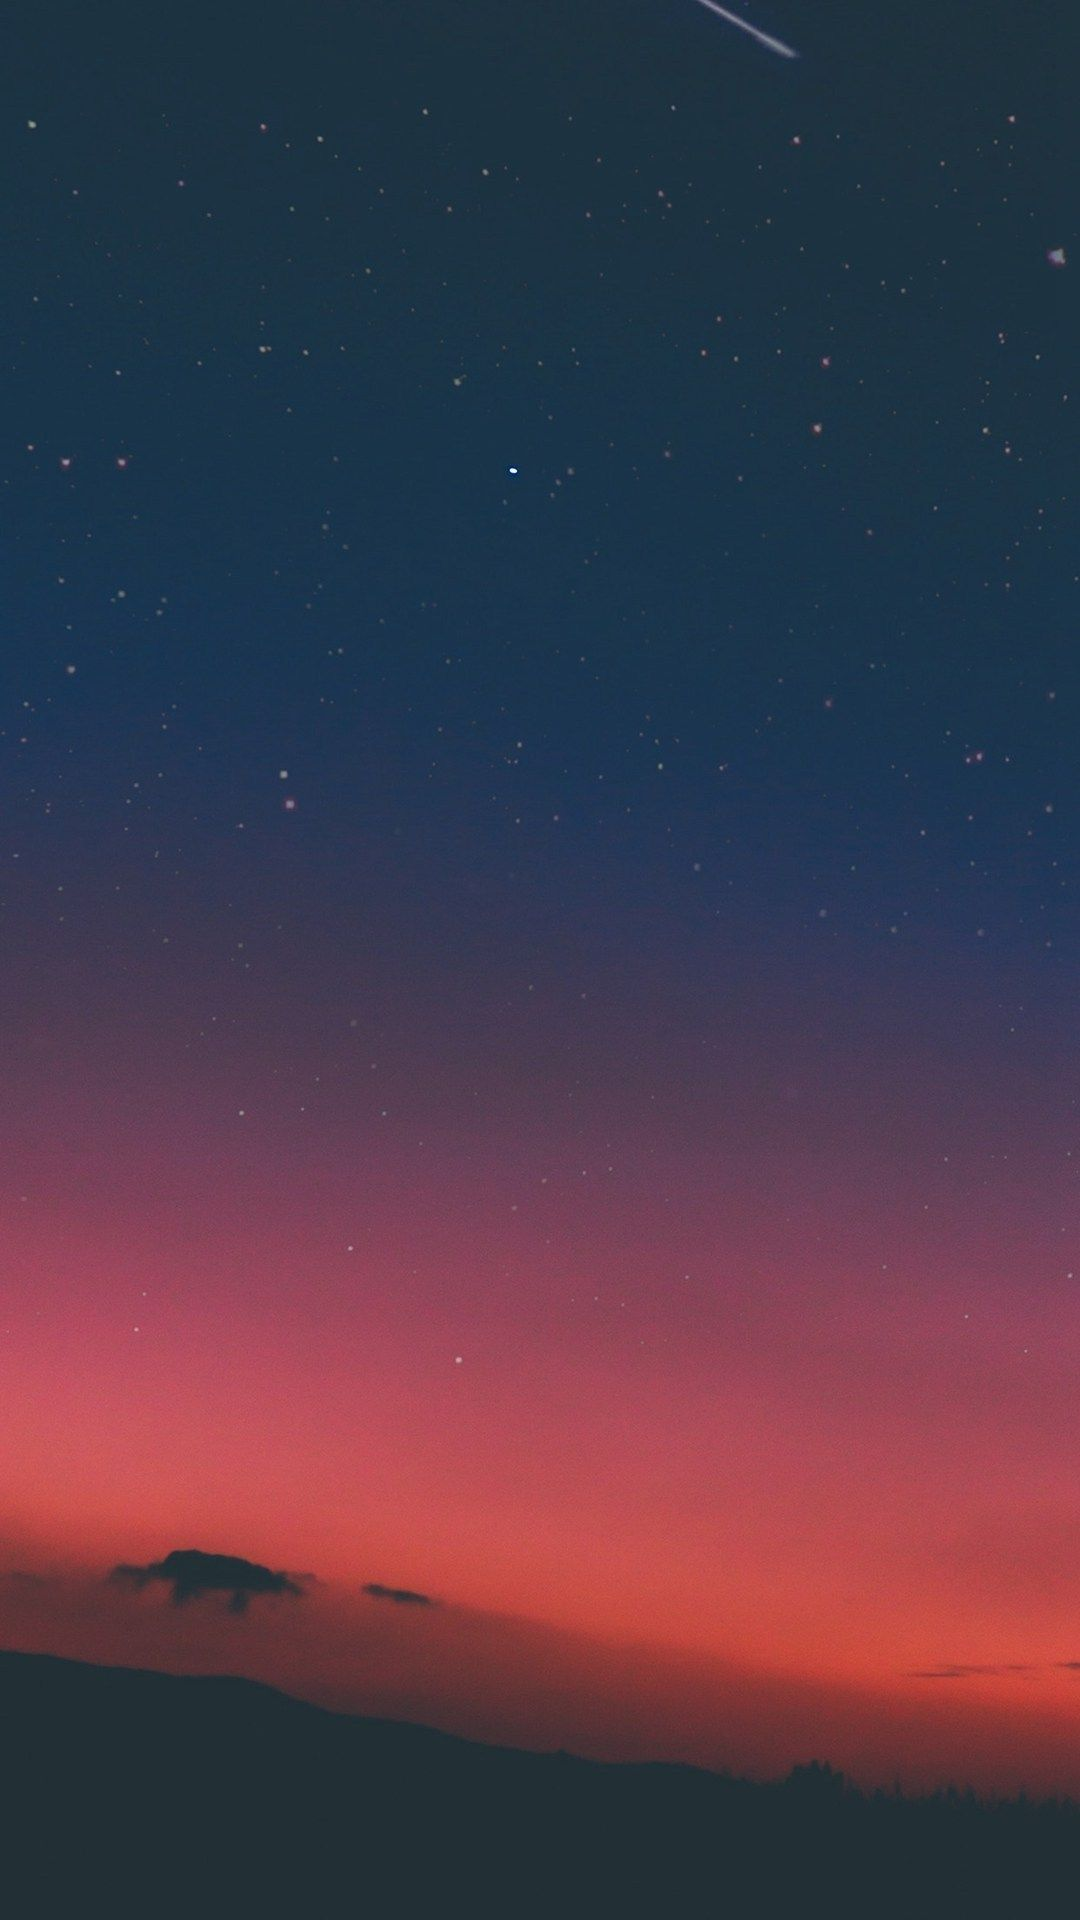 Best Ever Iphone Wallpapers Wallpaperboat